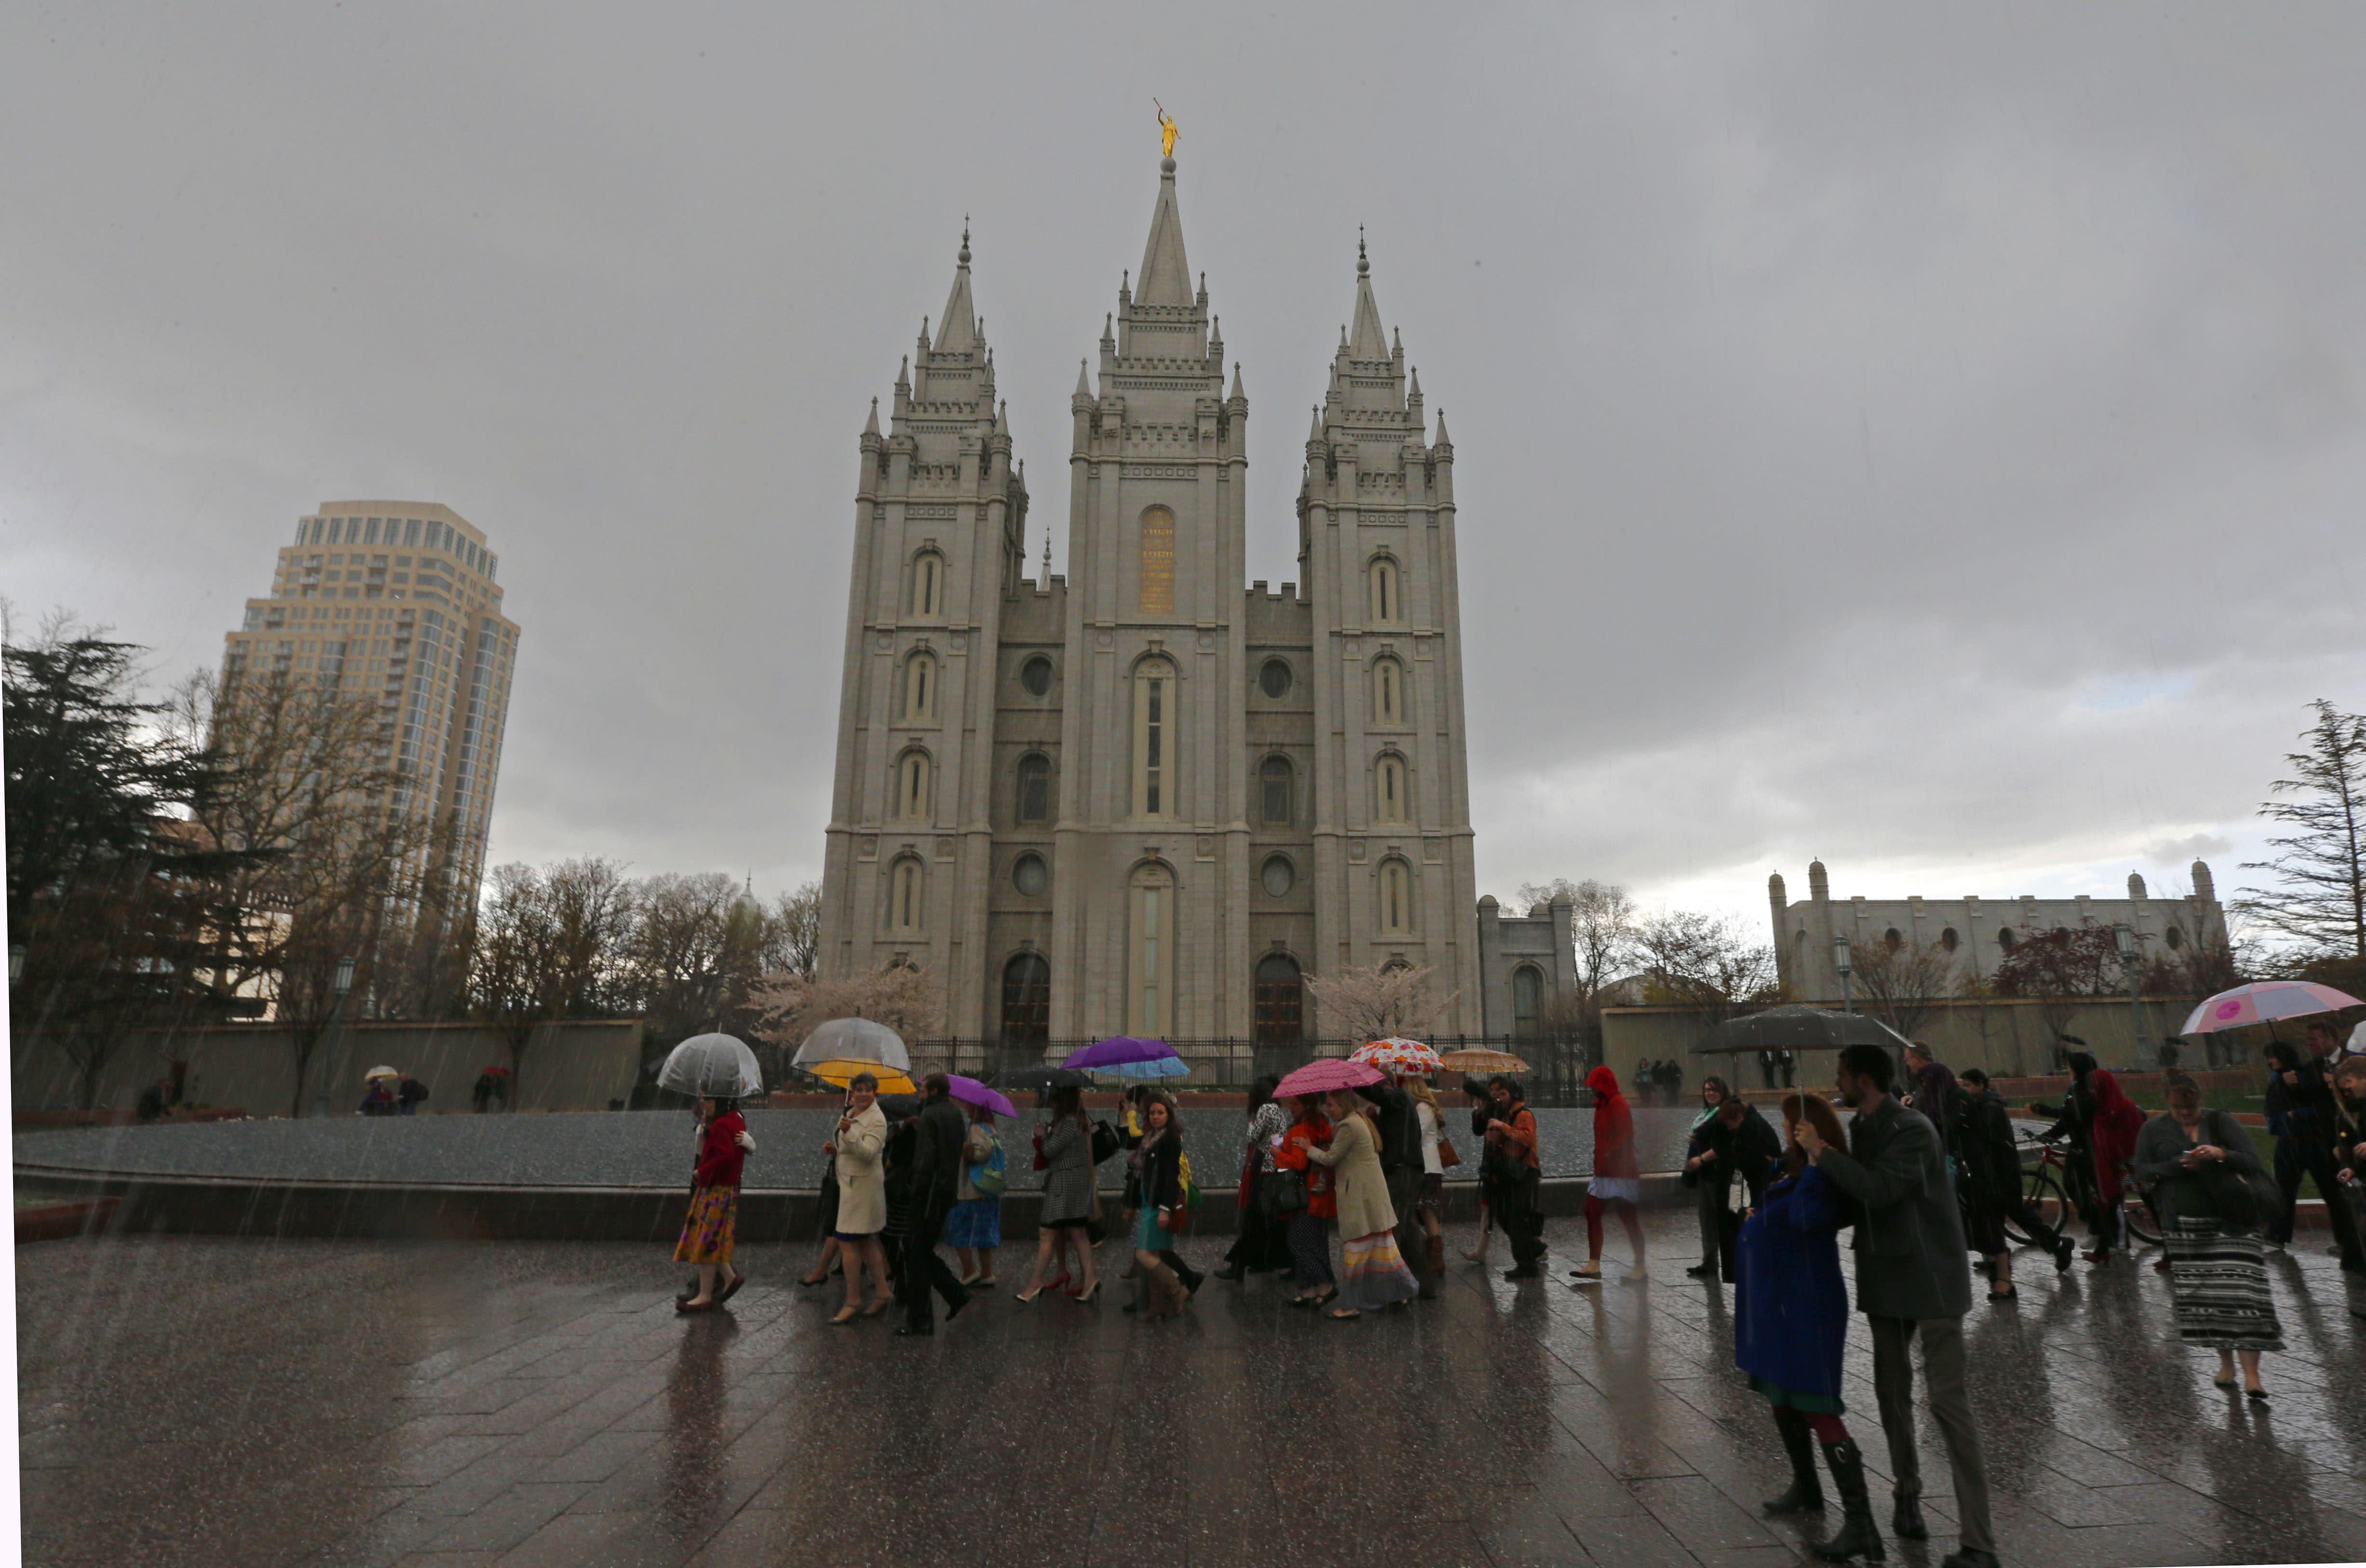 People walk past the Salt Lake Temple of the Mormon church on April 5, 2014 in Salt Lake City, Utah (AFP Photo/George Frey)